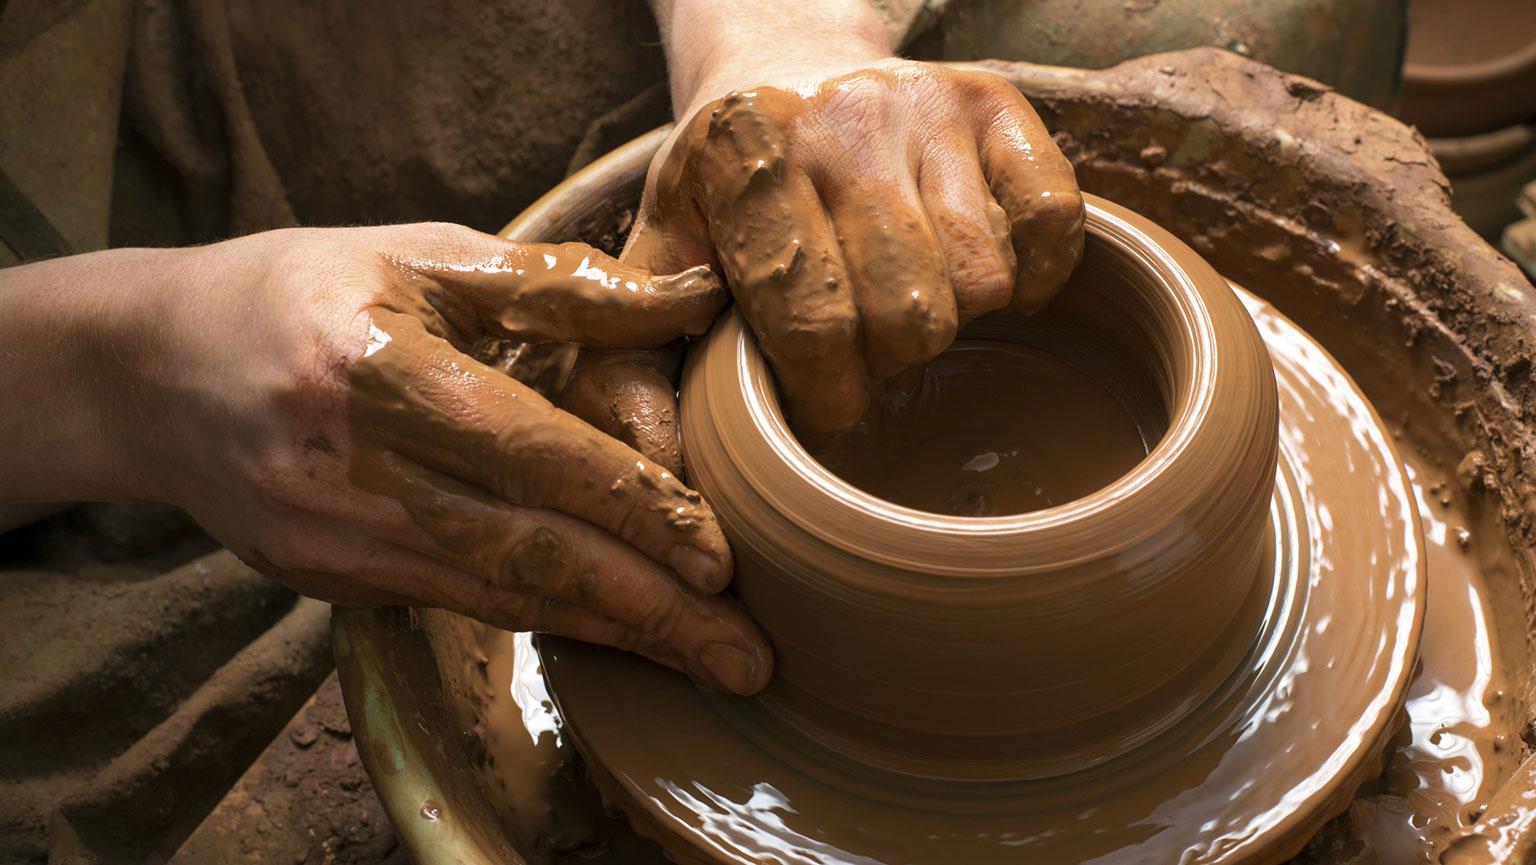 the potter u2019s wheel and metallurgy